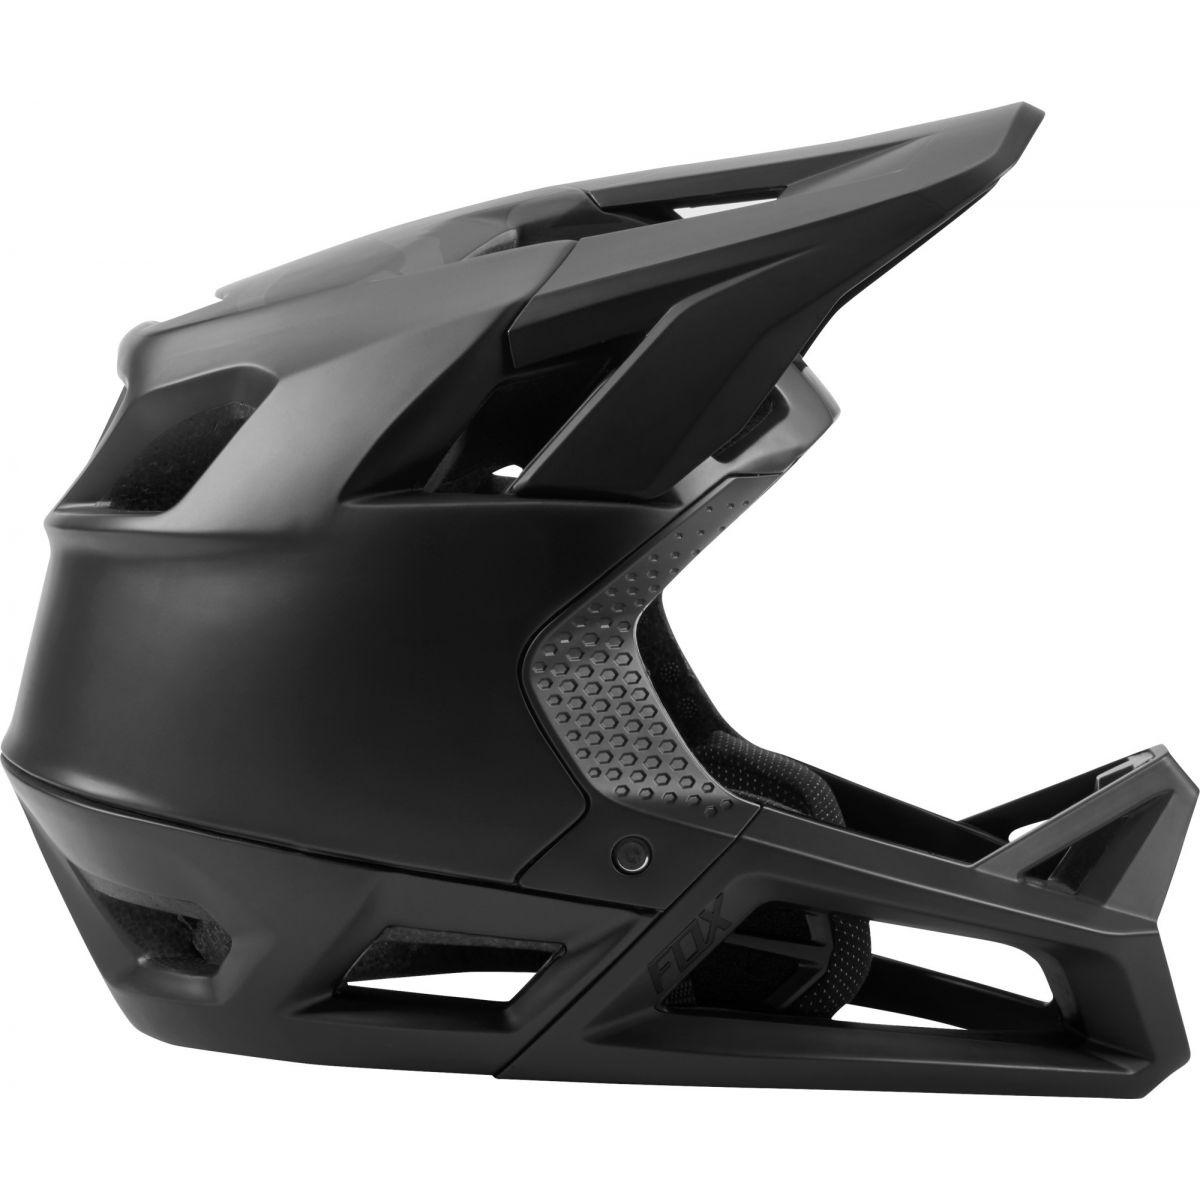 Casco integral Enduro Fox Proframe black camo camuflaje casco fox a65a7bcdbf9